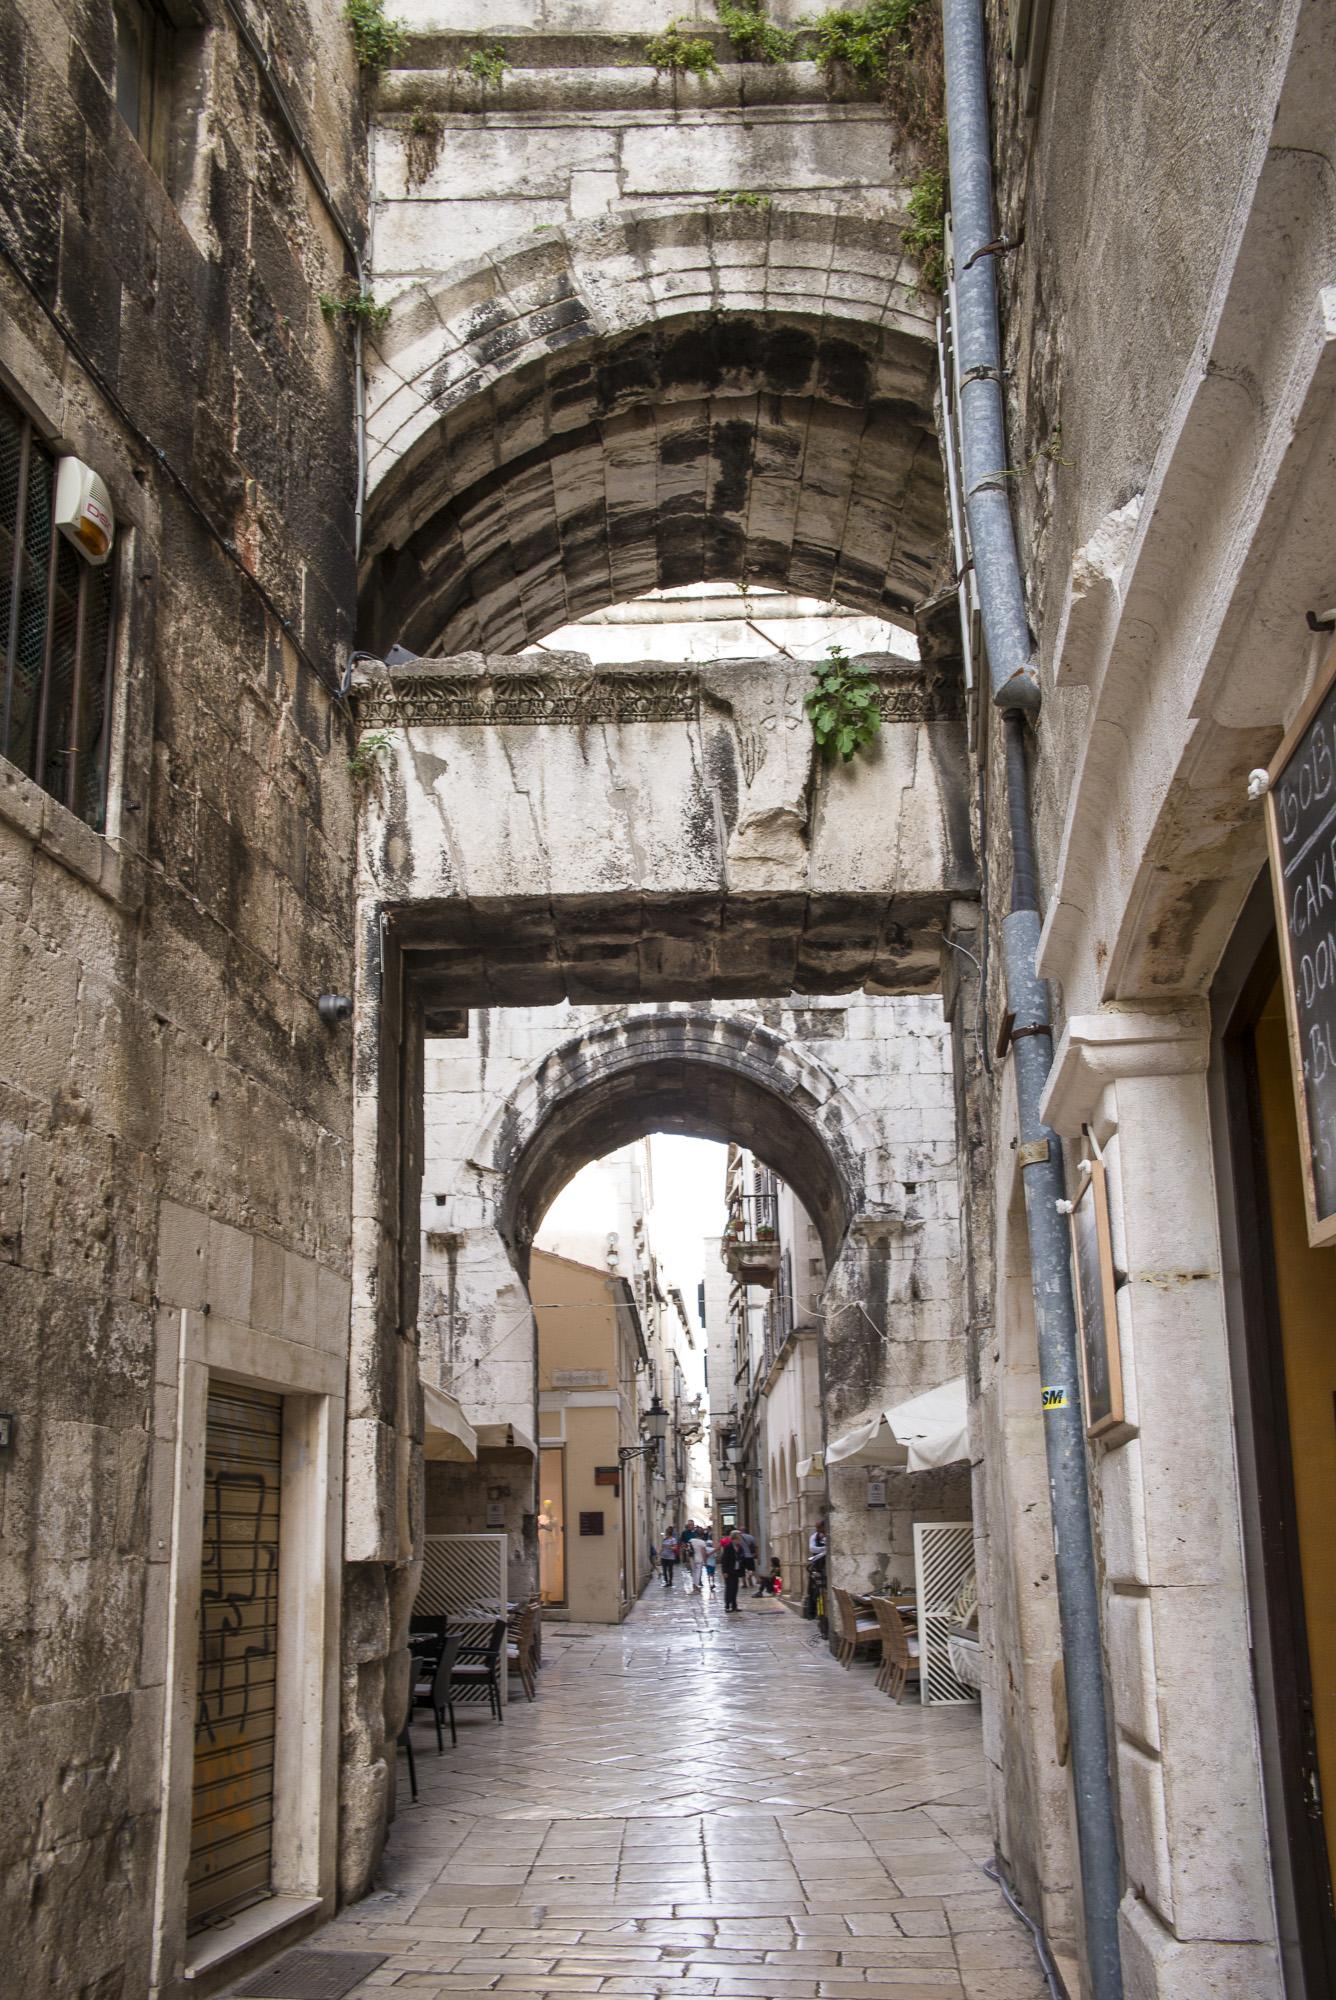 Passage way through the palace